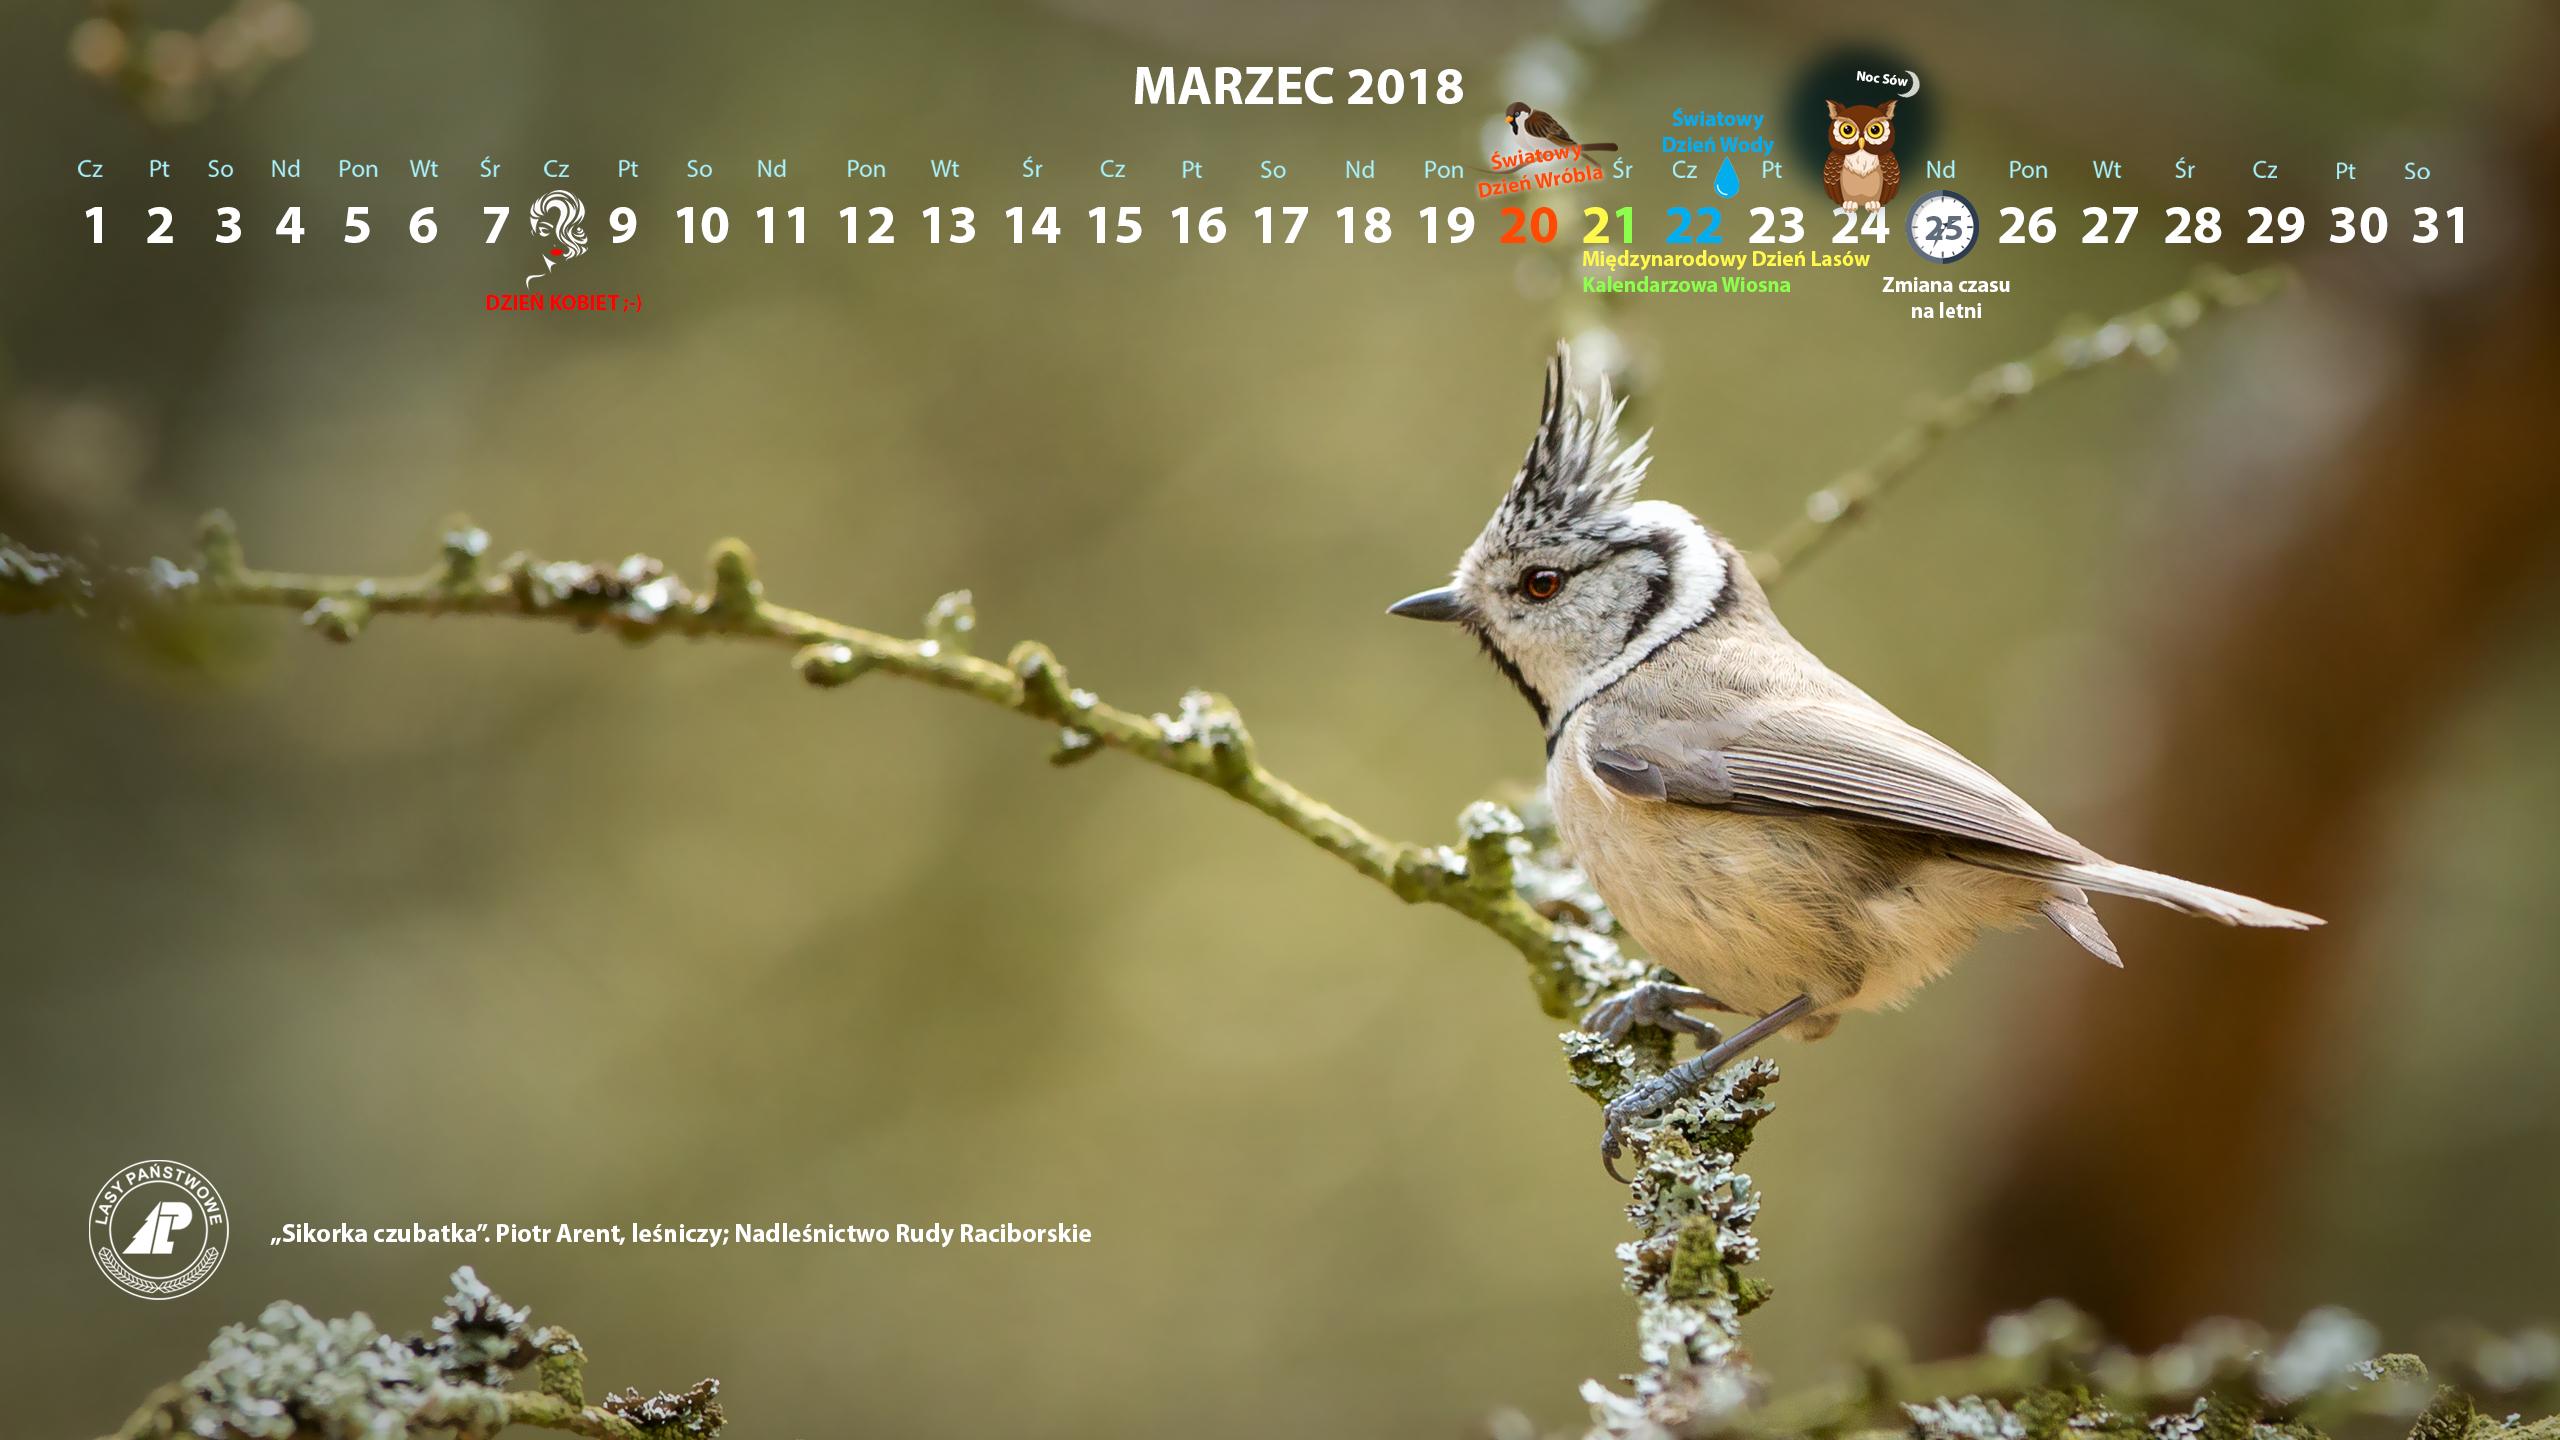 Kalendarz_MARZEC_2018_2560x1440[1].jpg